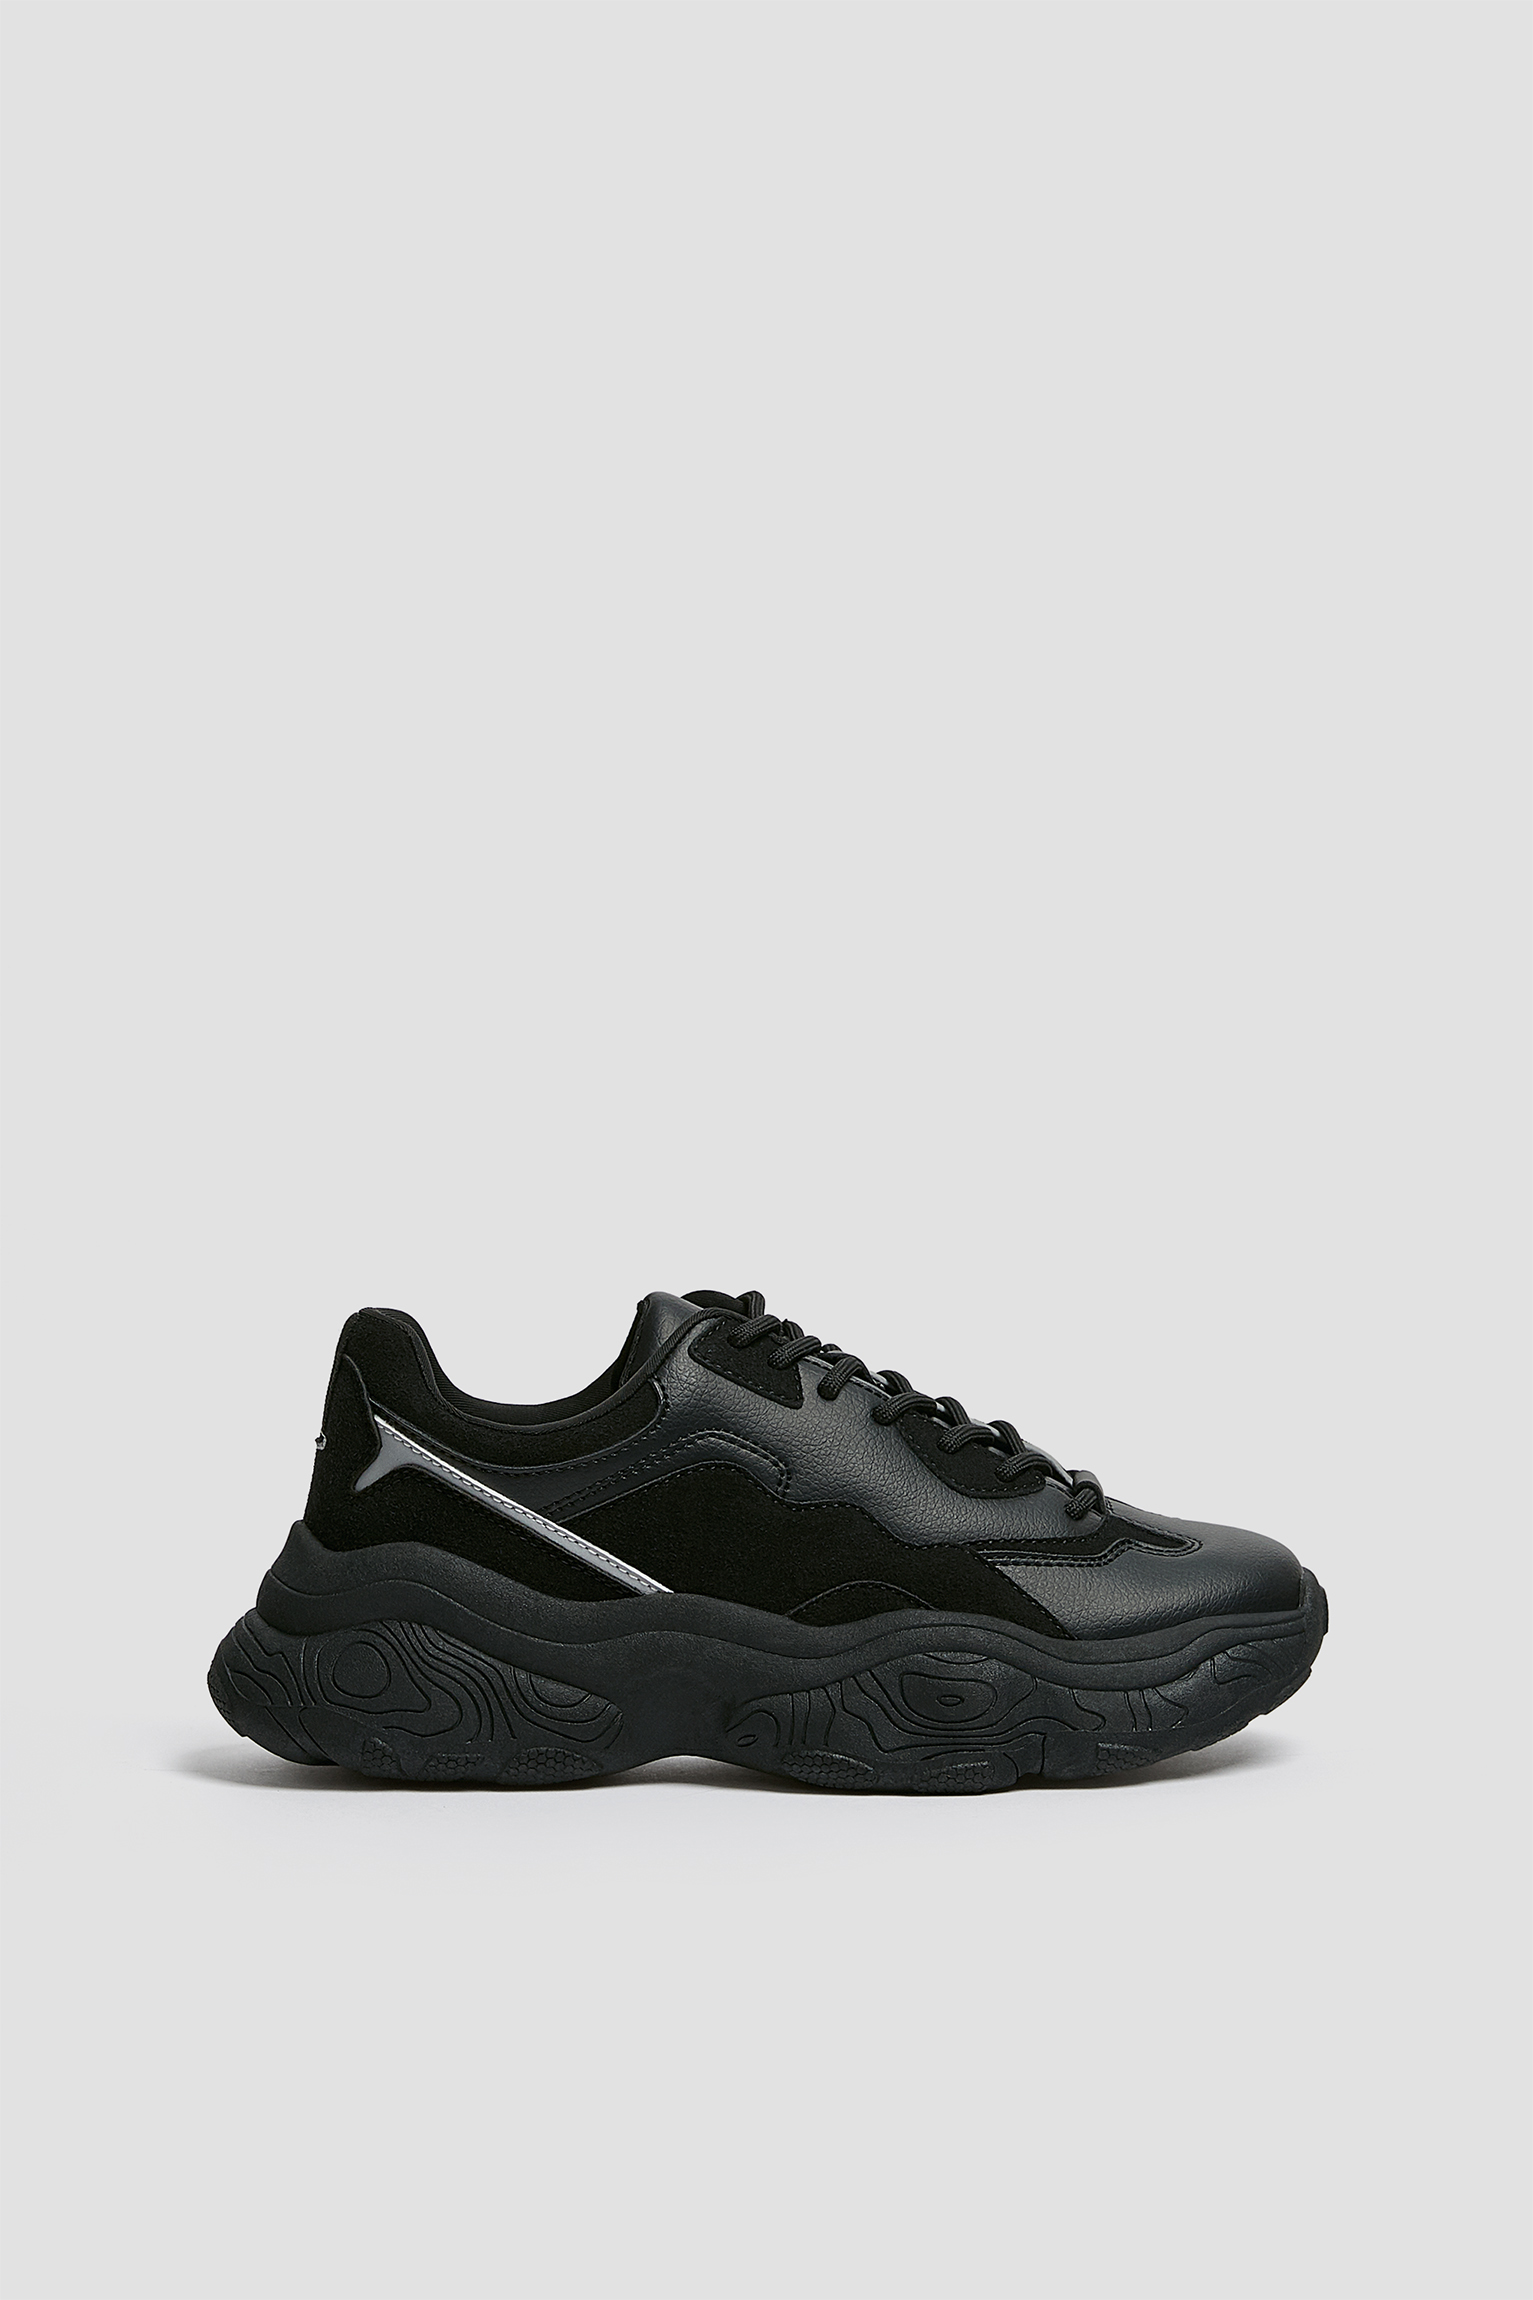 STWD chunky sole trainers - PULL\u0026BEAR